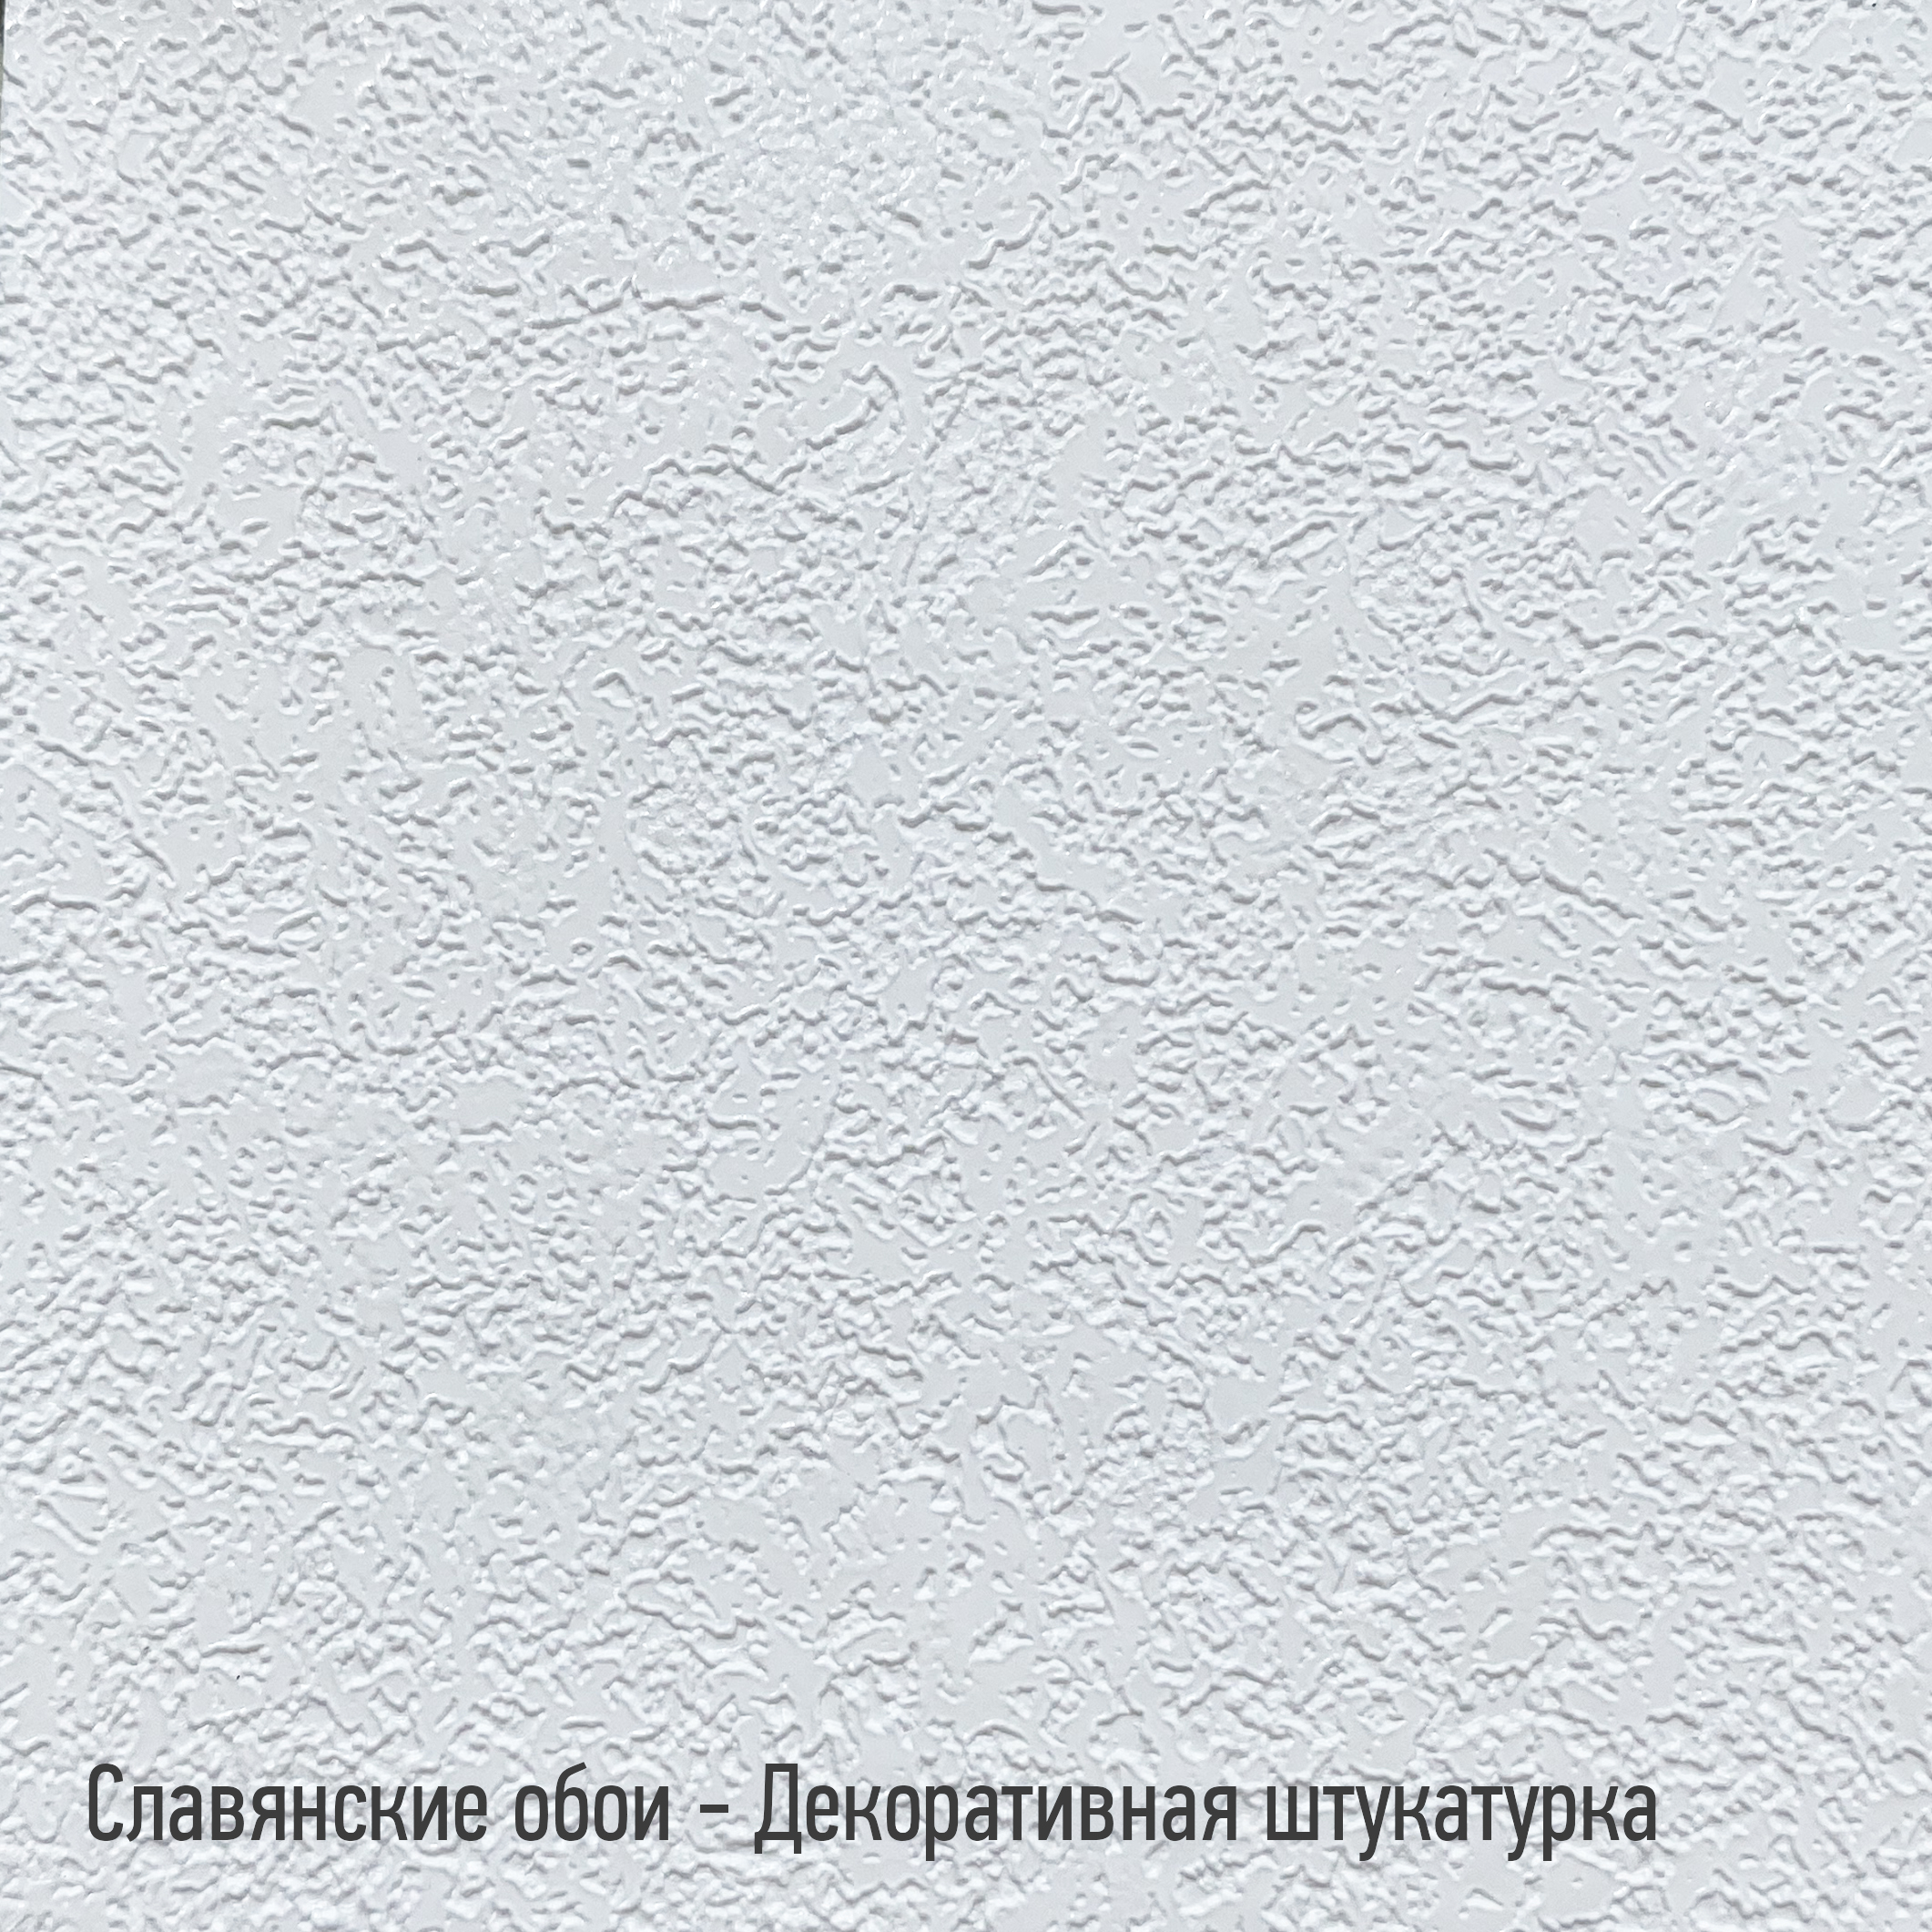 Славянские обои Декоративная штукатурка - фото №1